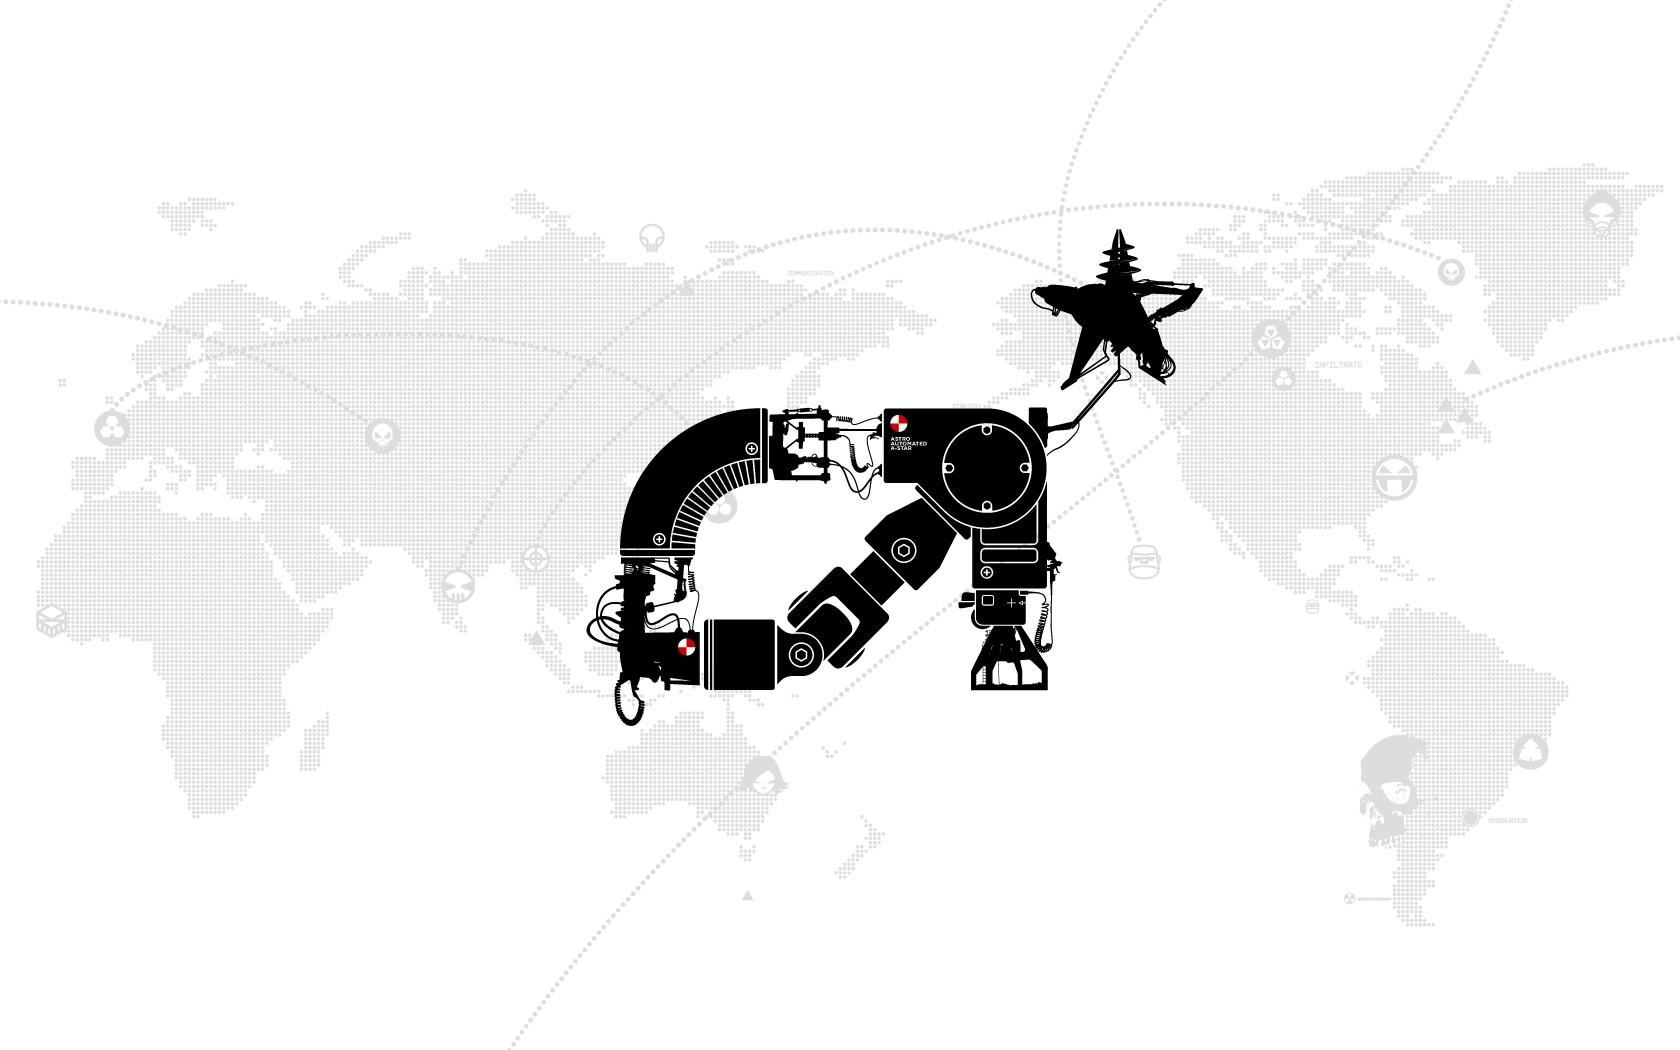 astro gaming Wallpaper digital design ecommerce specialist 1680x1050